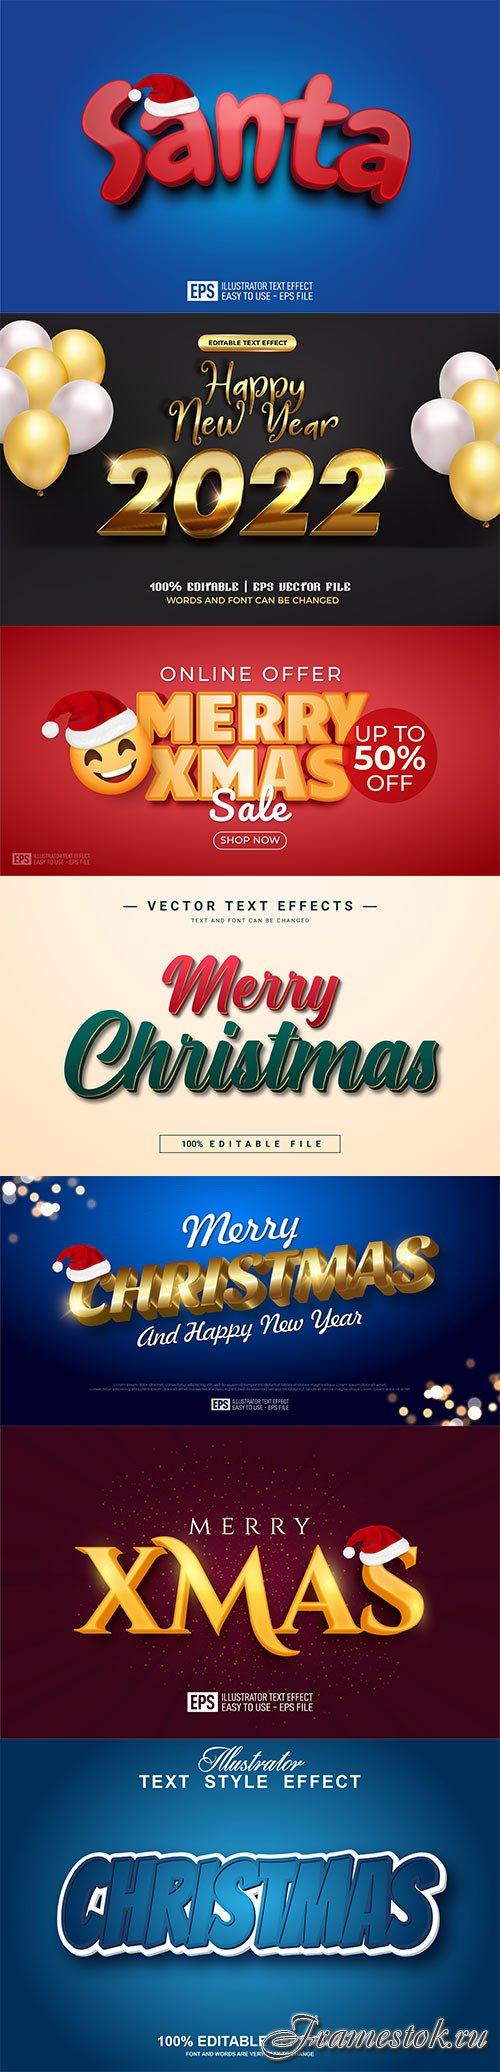 2022 New year, Merry christmas editable text effect premium vector vol 17